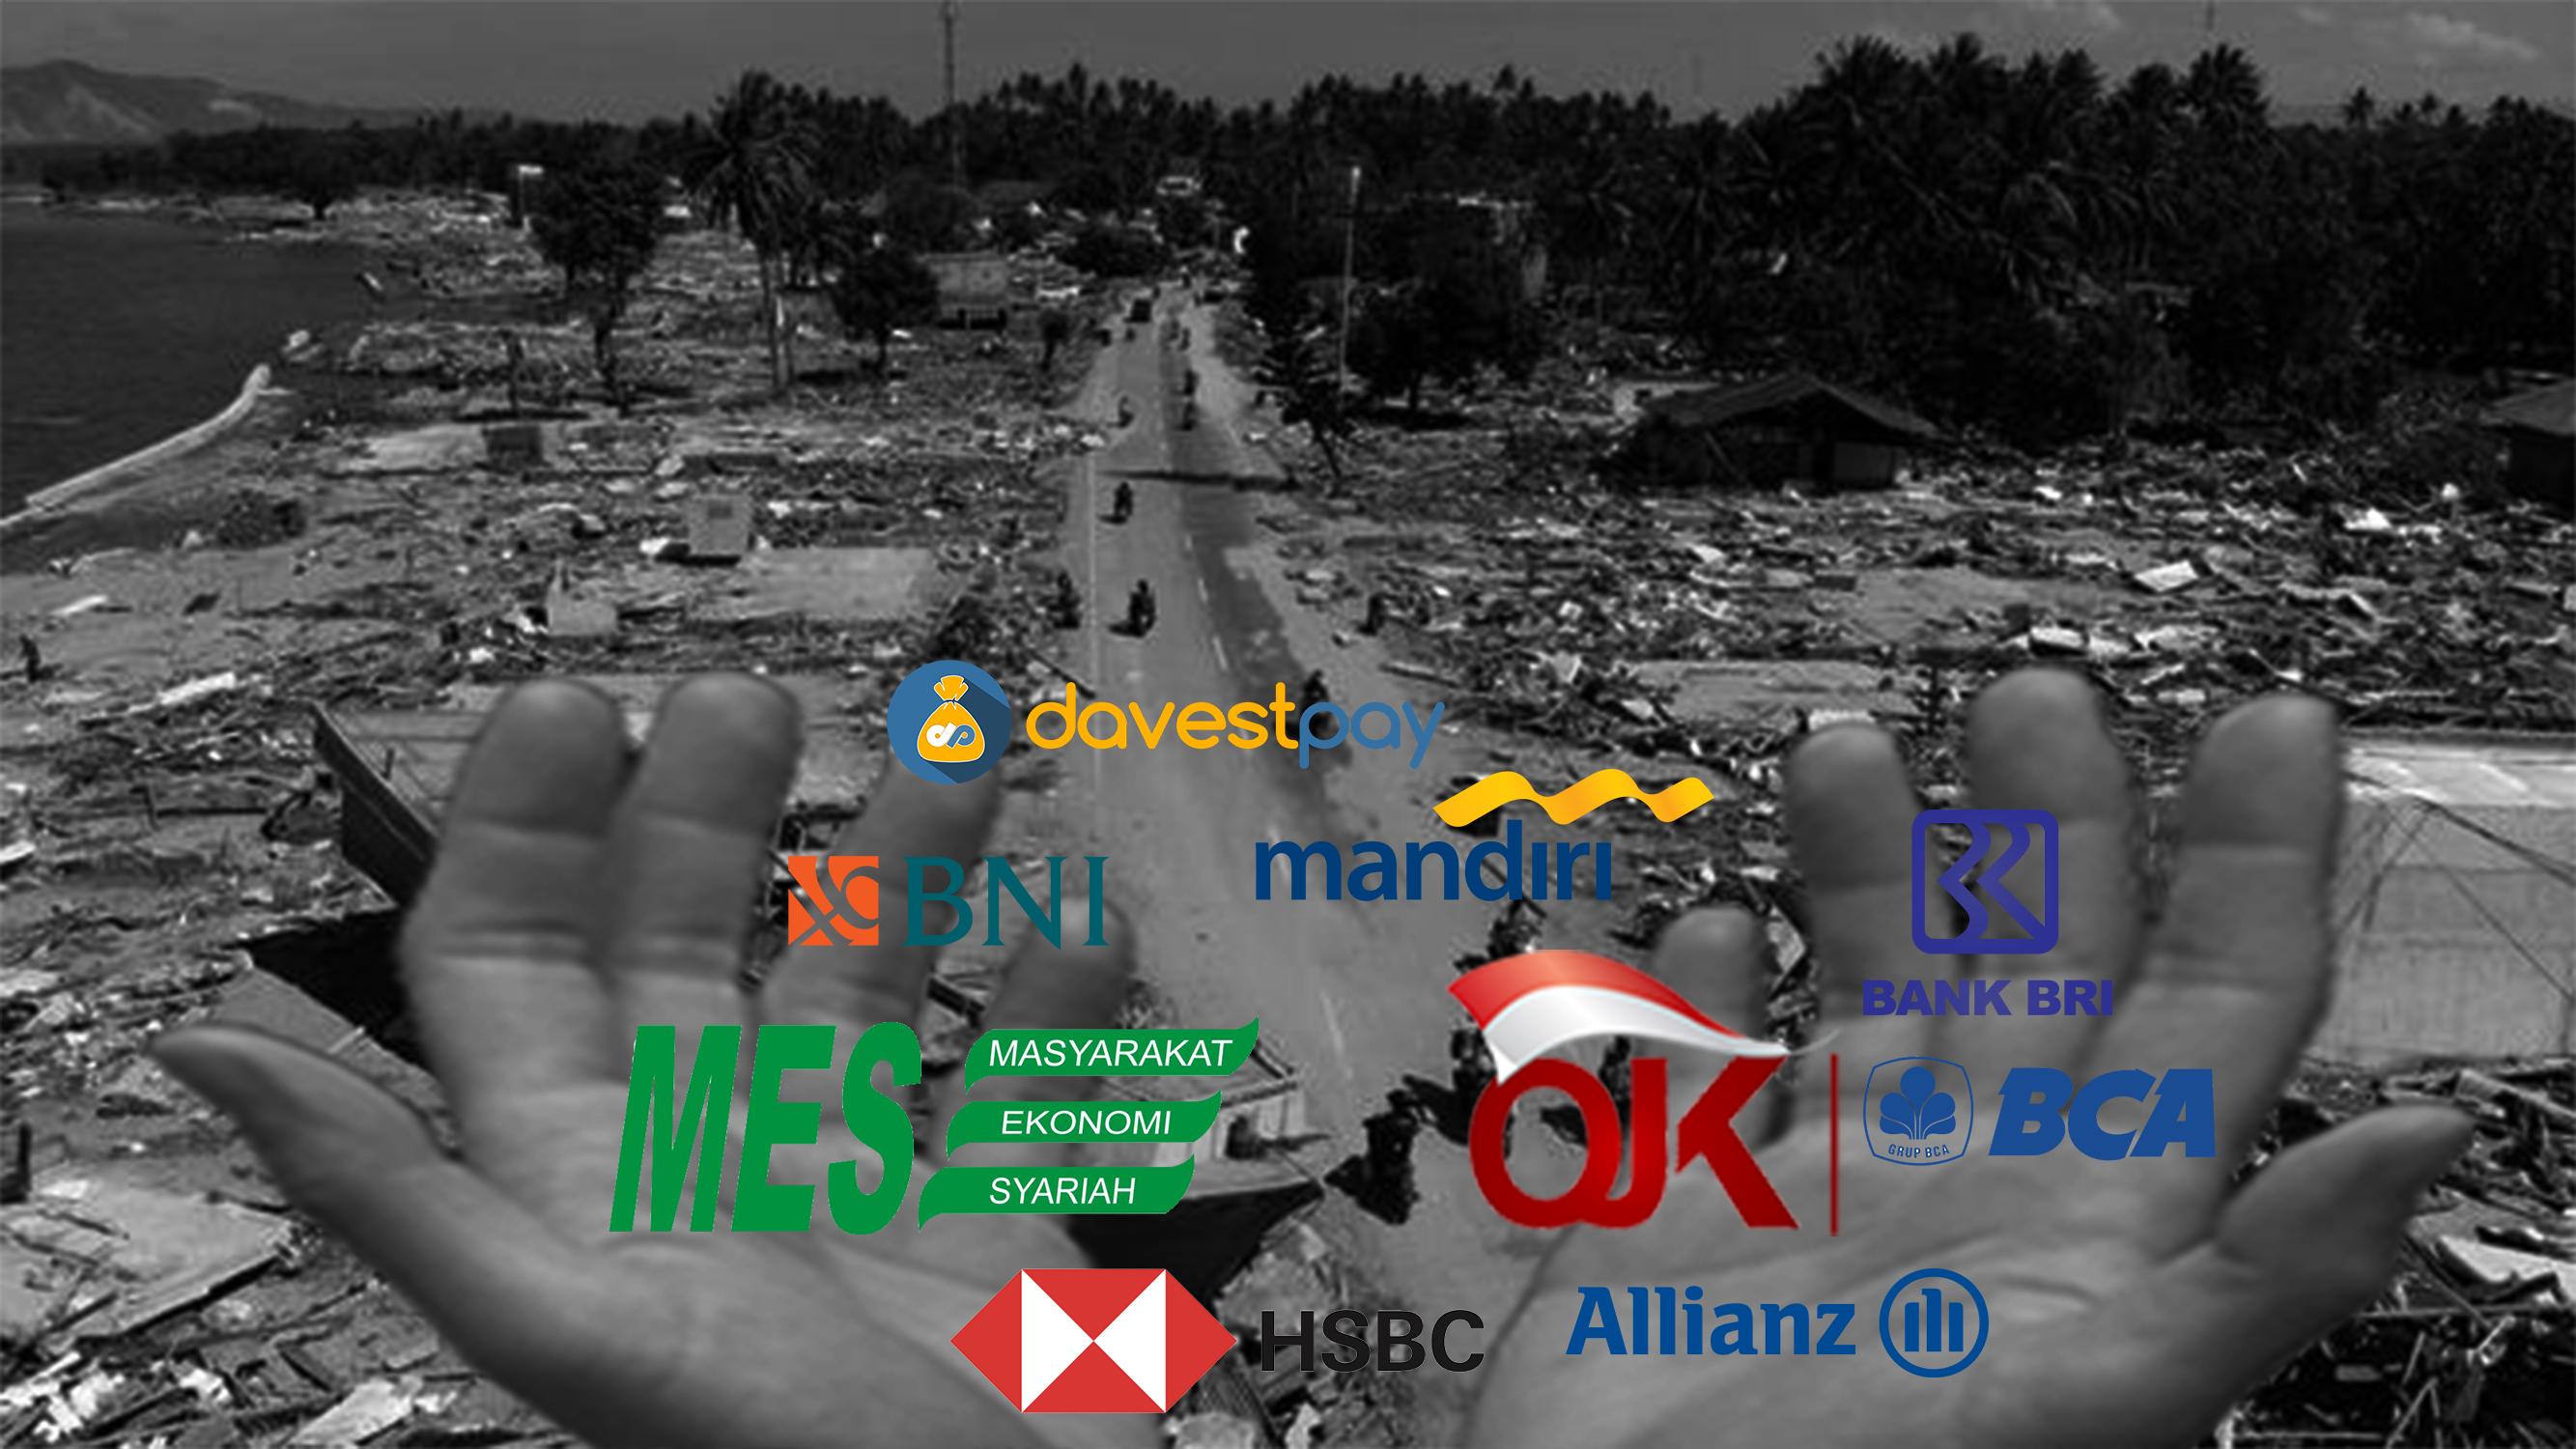 OJK dan Industri Keuangan Himpun Dana Rp 18,5 Miliar untuk Palu dan Donggala